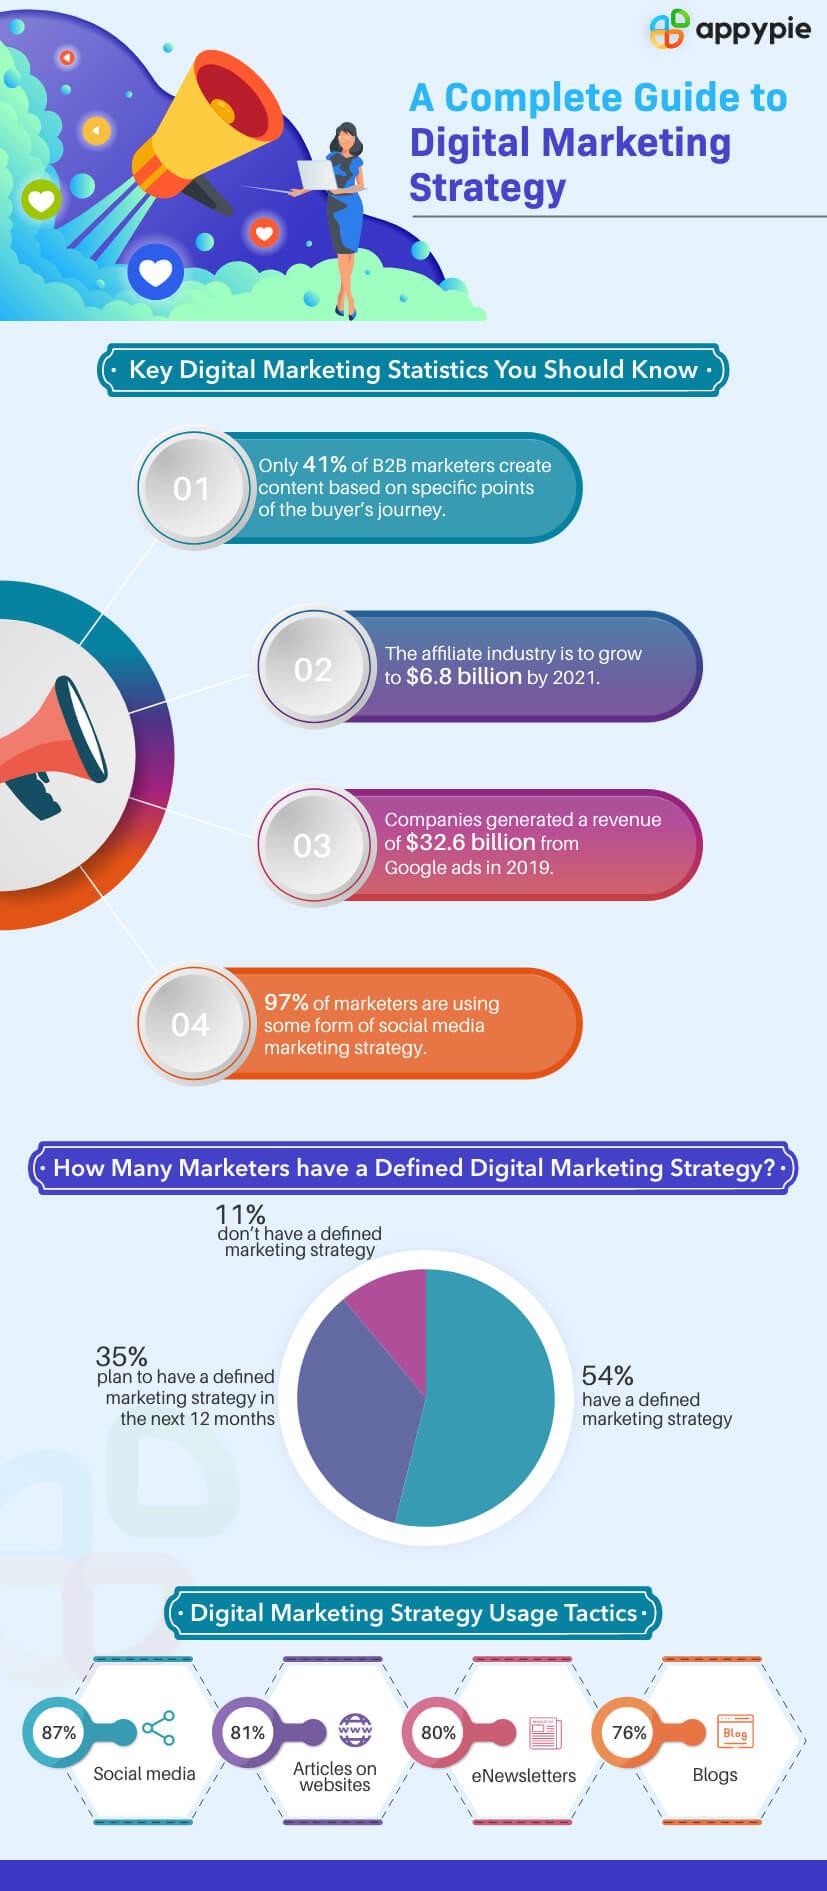 7 Digital Marketing Strategy Examples